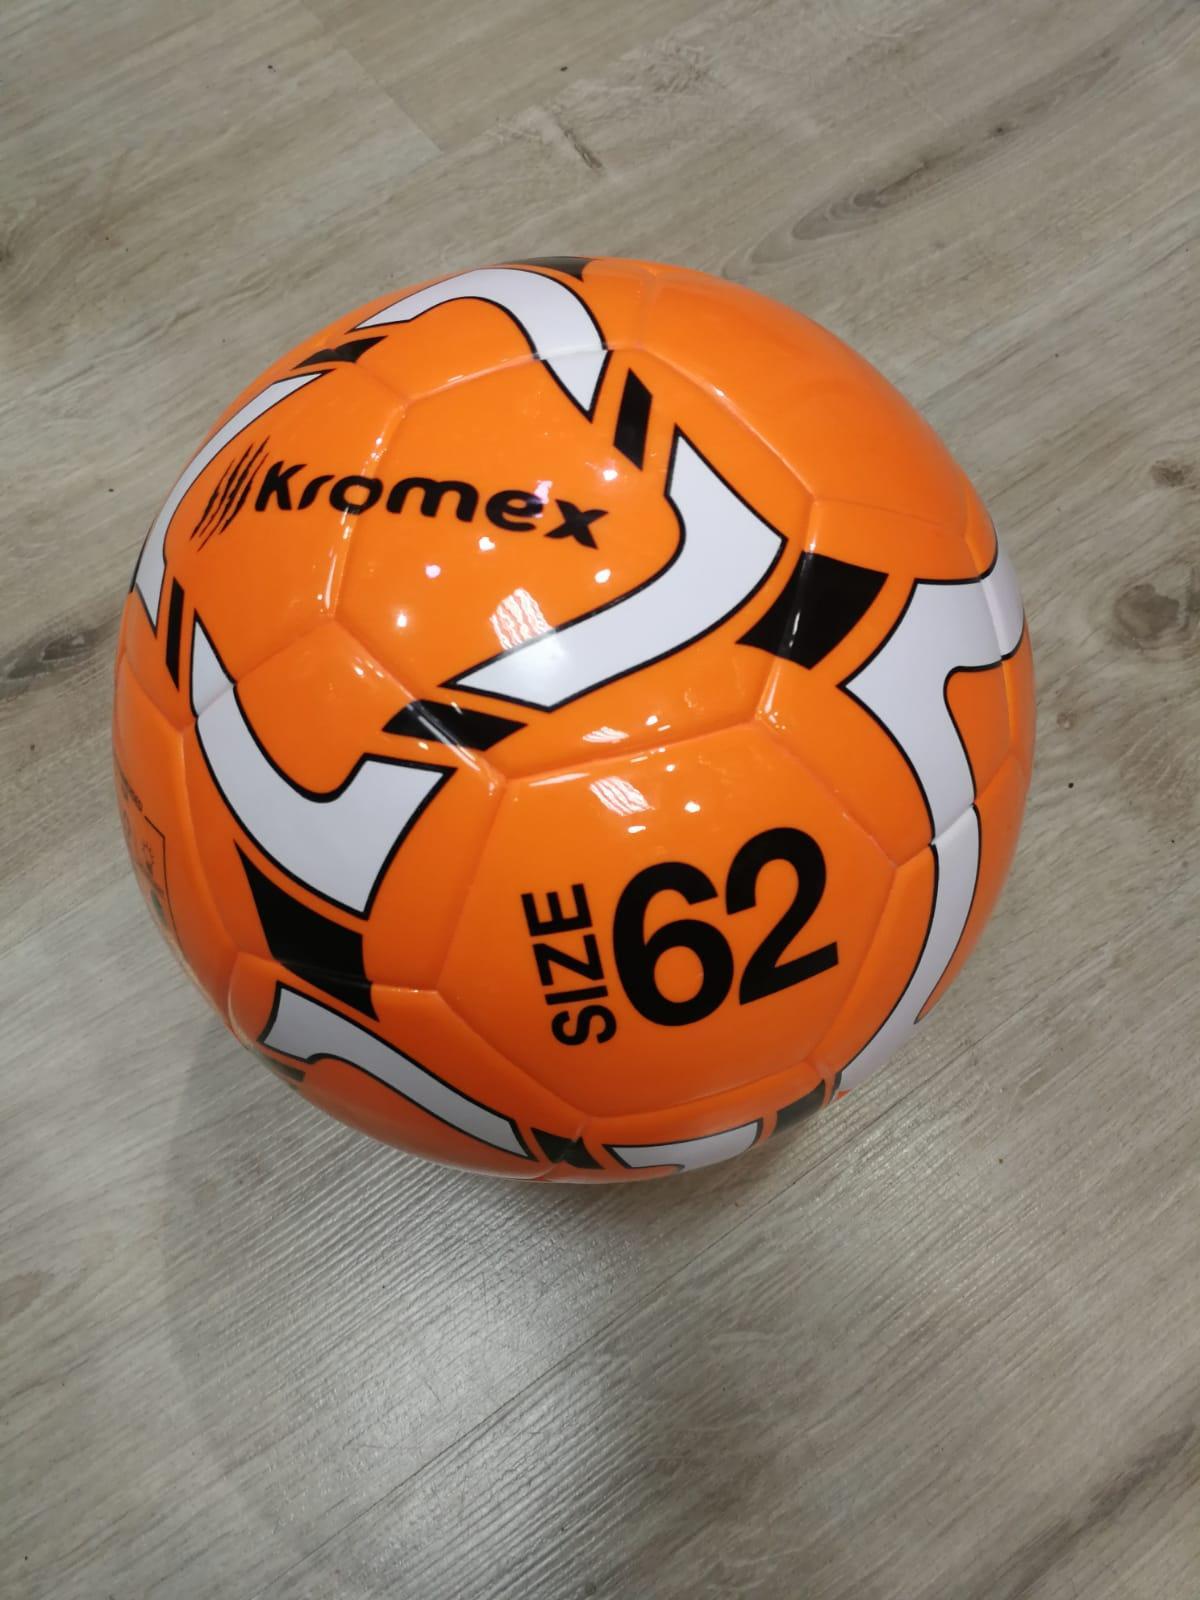 Balon Futbol Sala Kromex de 62 cm Naranja